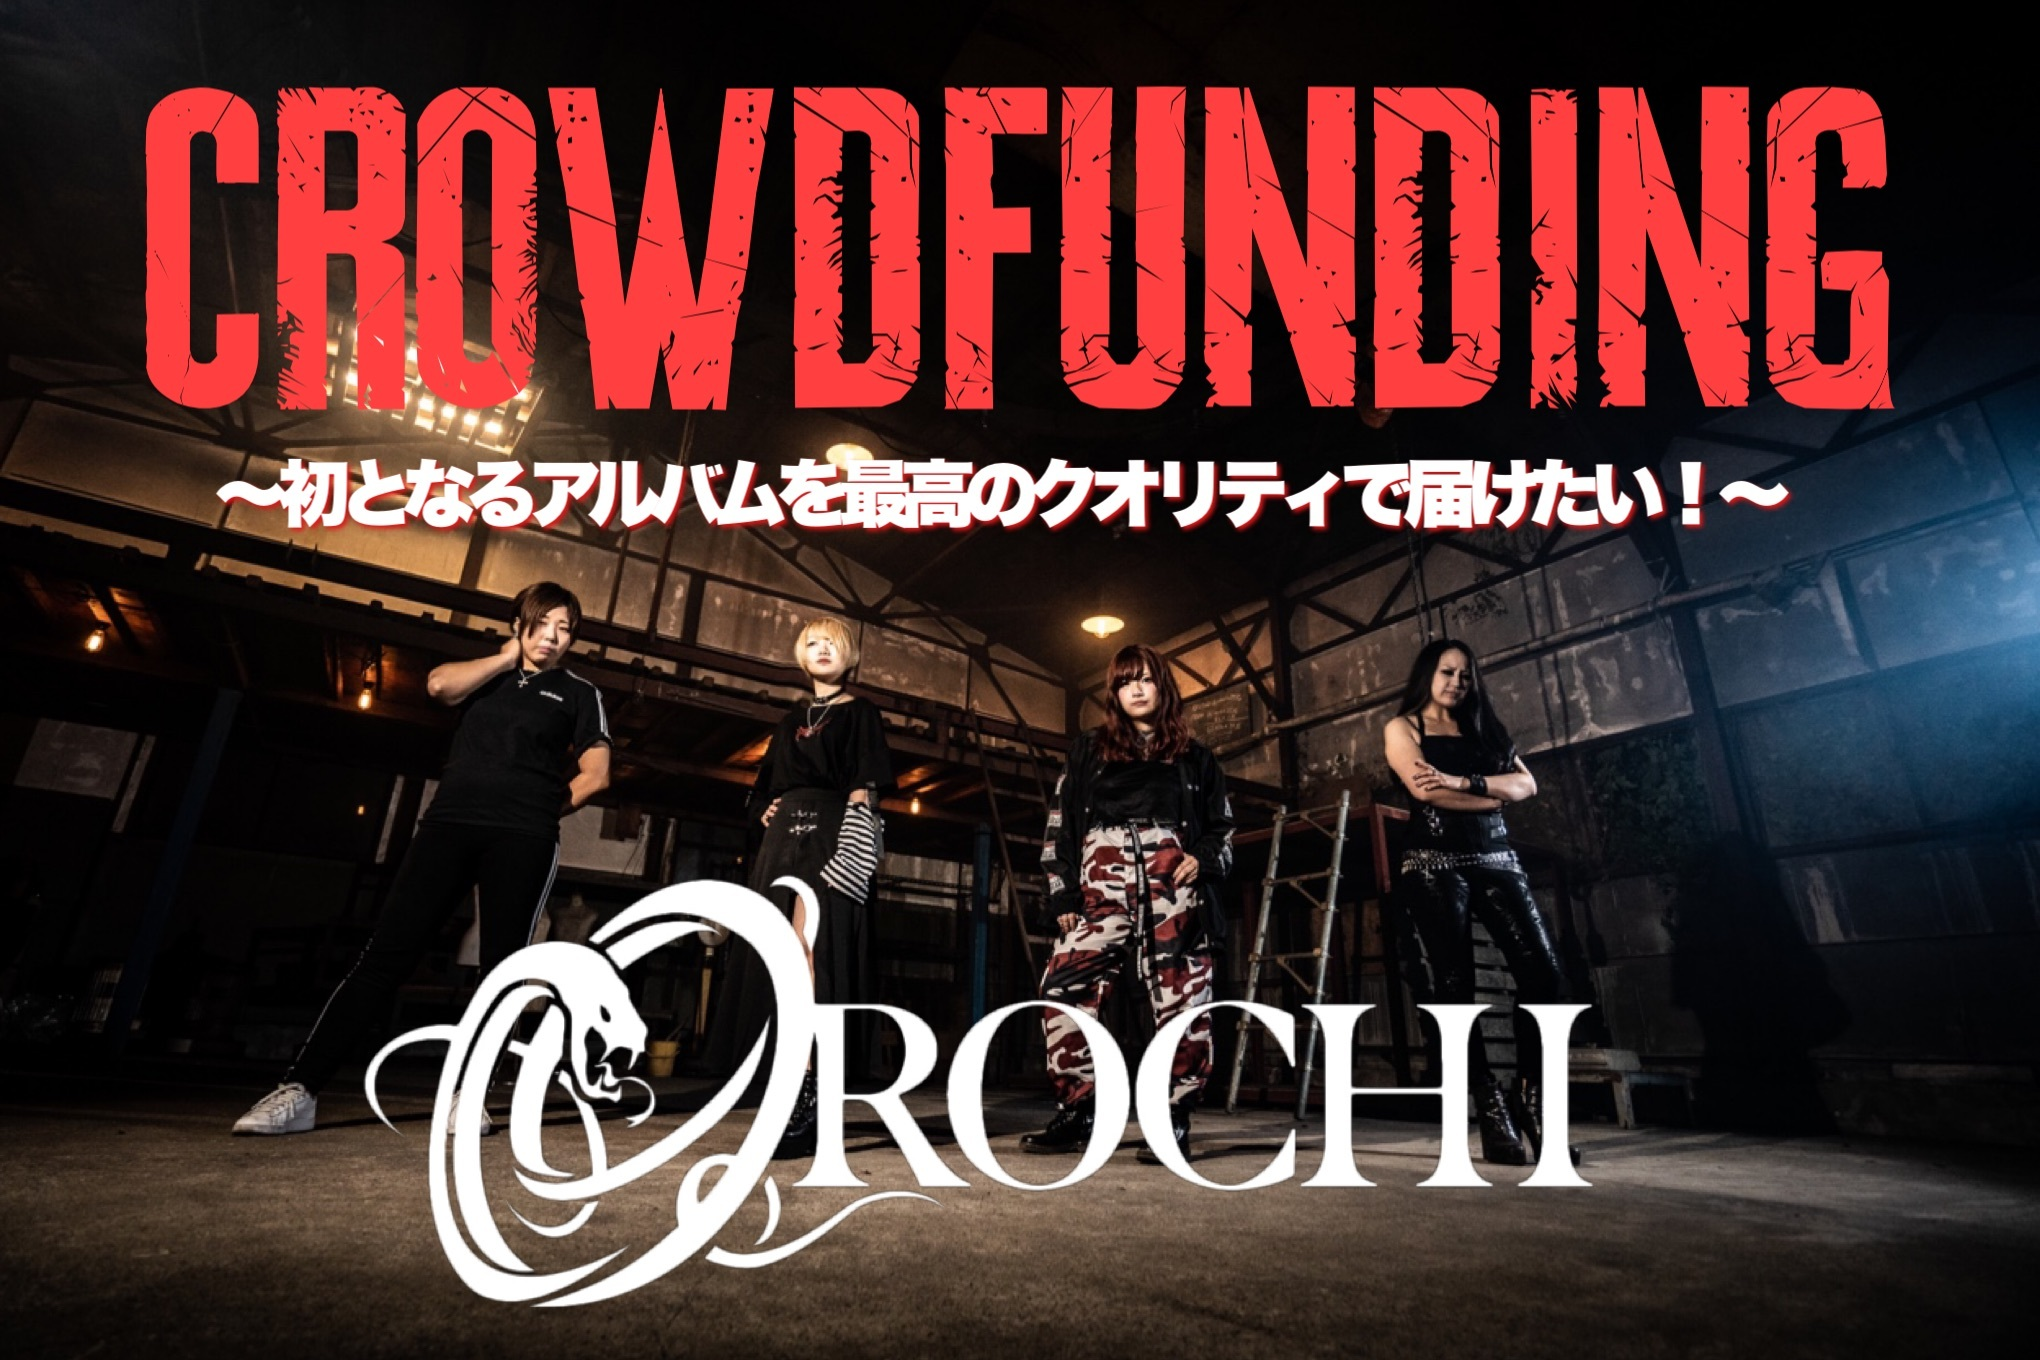 【OROCHI】初となるアルバムを最高のクオリティで届けたい!アルバム制作応援プロジェクト!